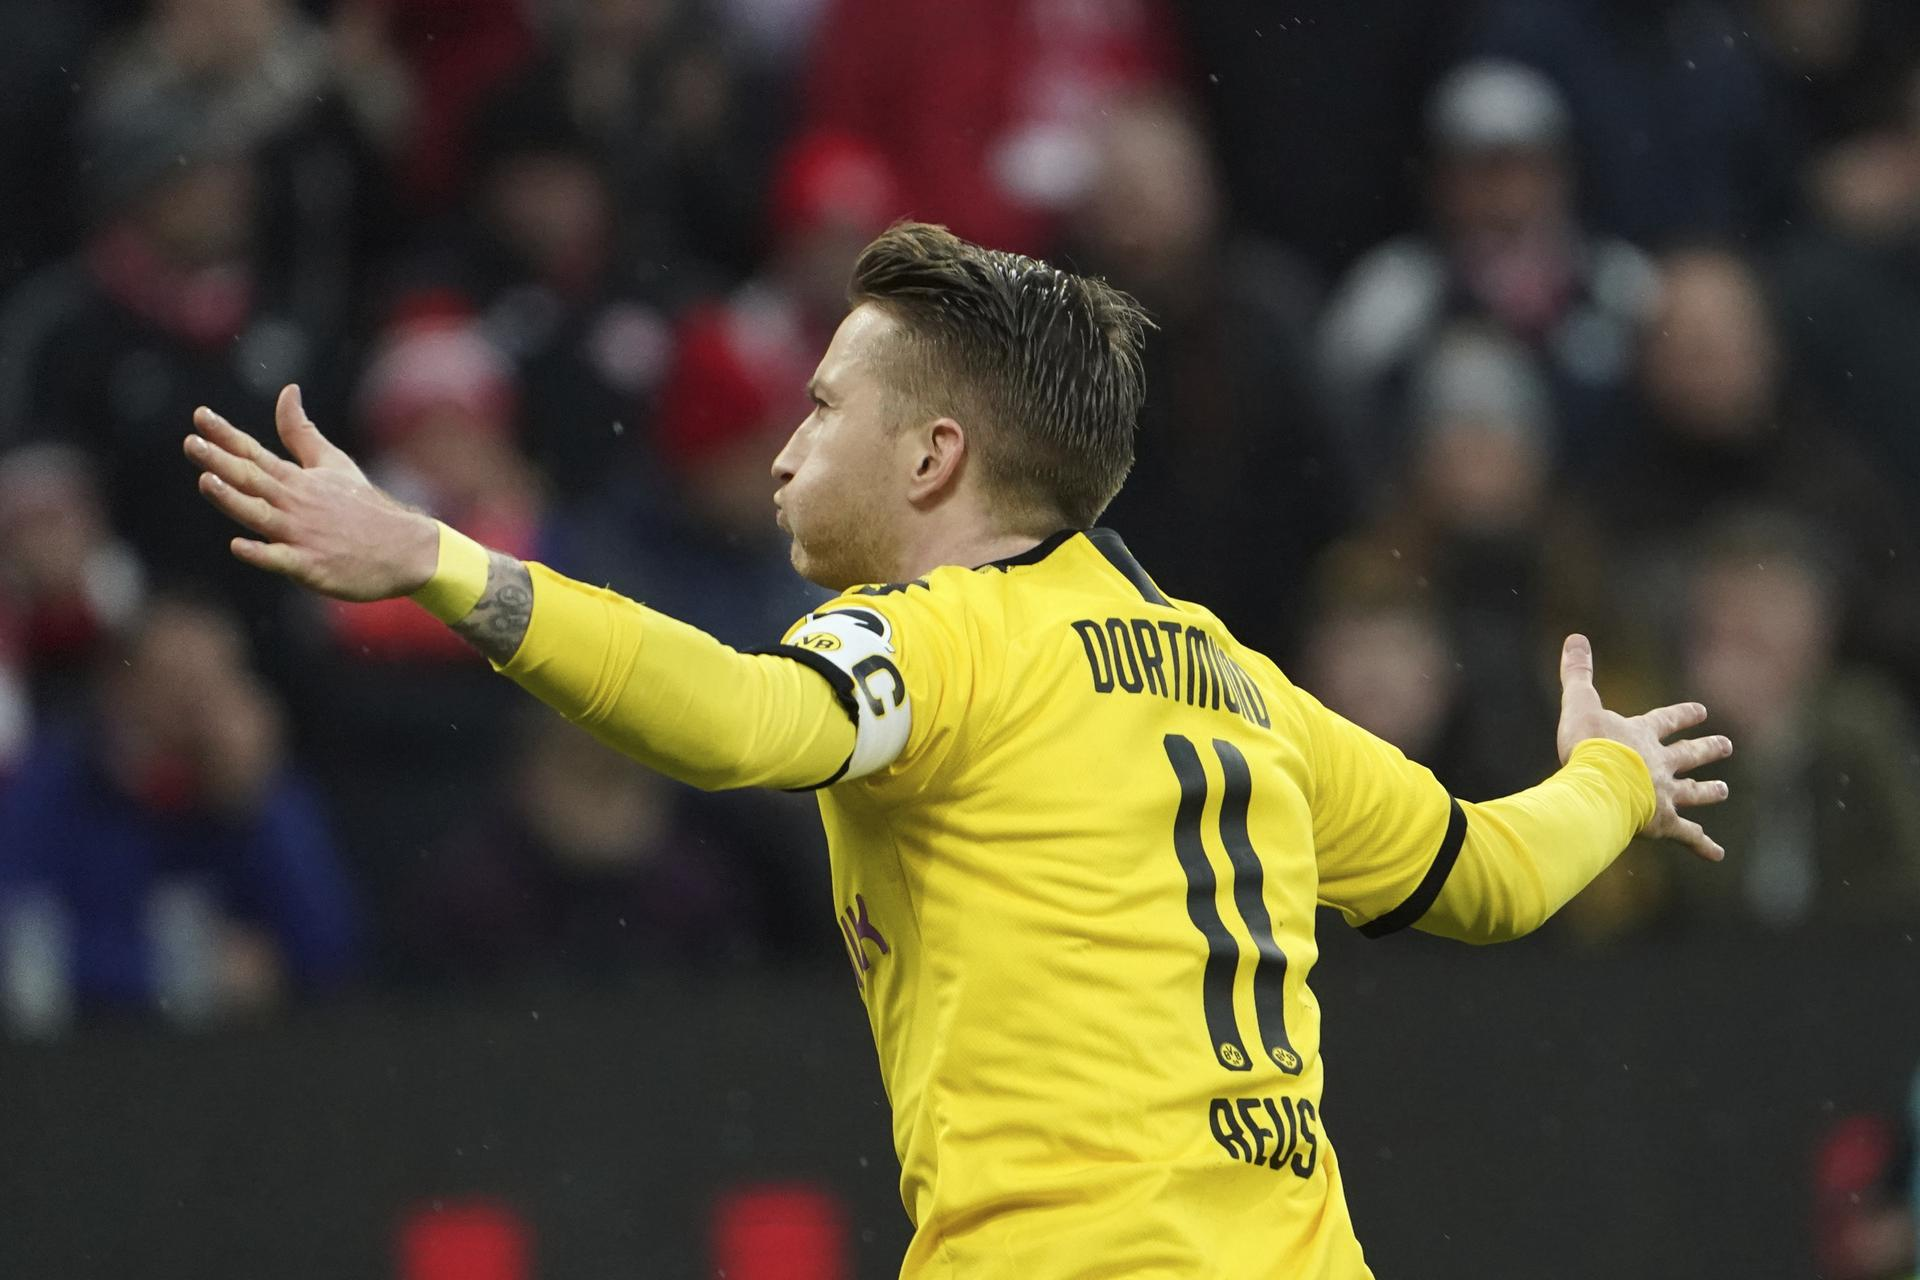 Borussia - PSG STREAM ONLINE NA ŻYWO Liga Mistrzów: Borussia - PSG STREAM LIVE w INTERNECIE Borussia - PSG TRANSMISJA ONLINE - Super Express